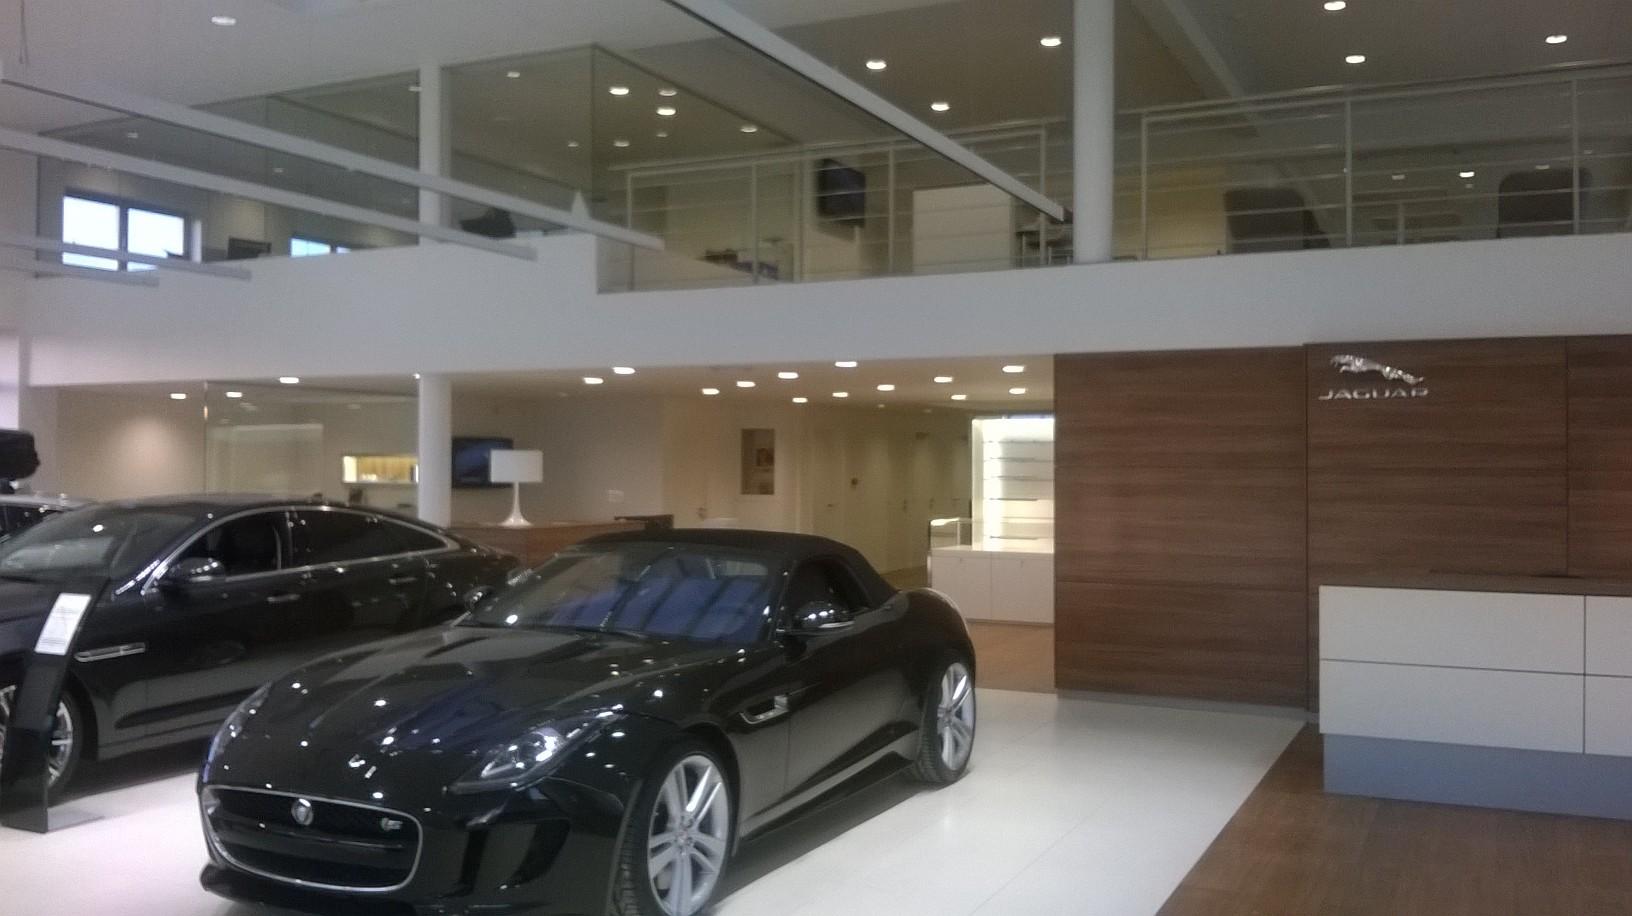 Jaguar - WP_20150107_006.jpg